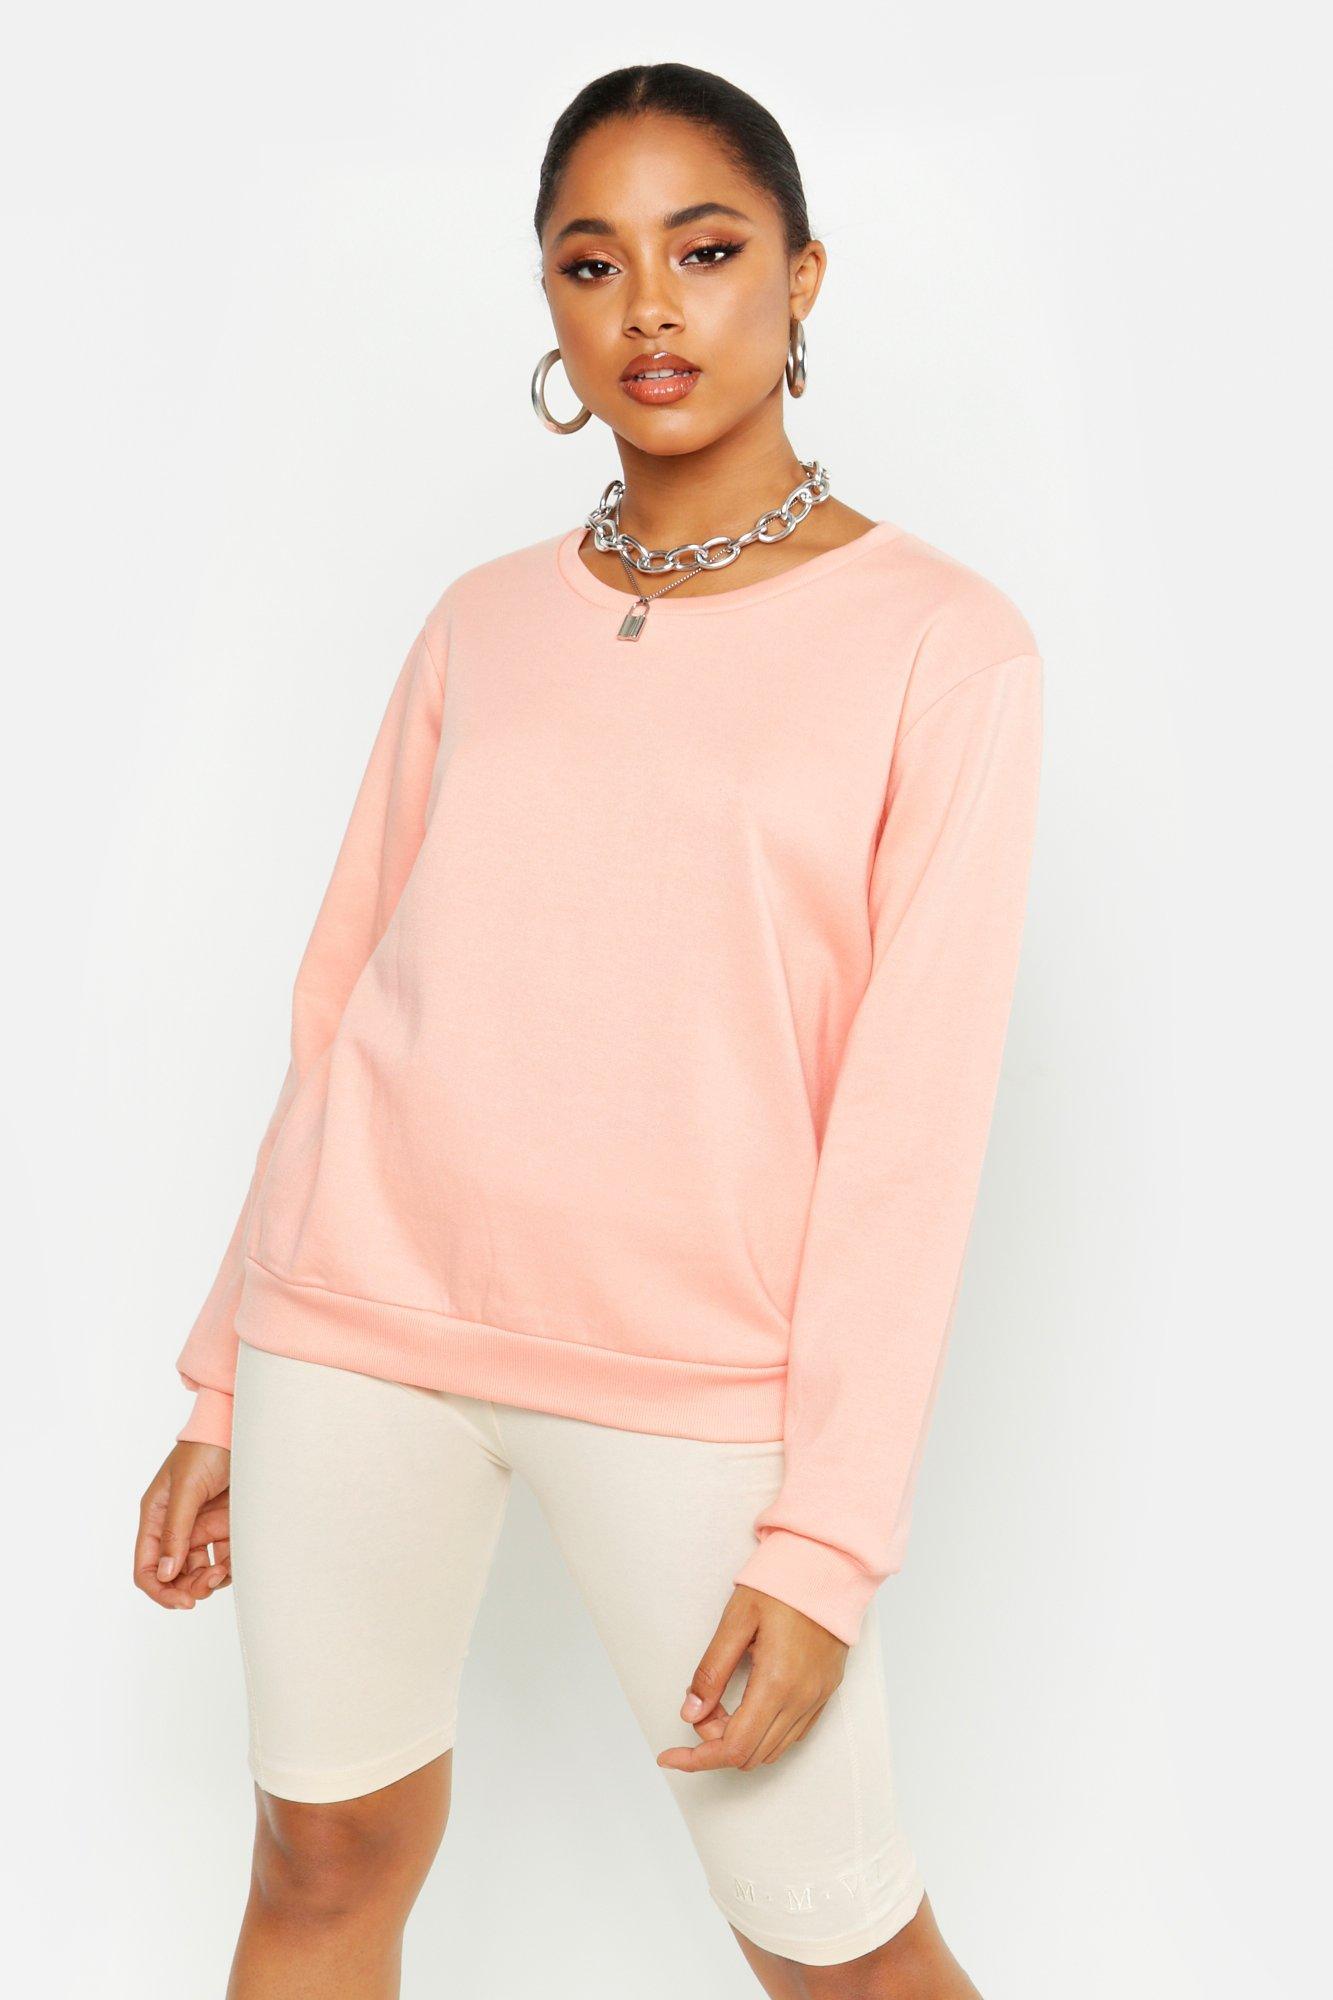 Womens Crew Neck Sweatshirt - peach - S, Peach - Boohoo.com